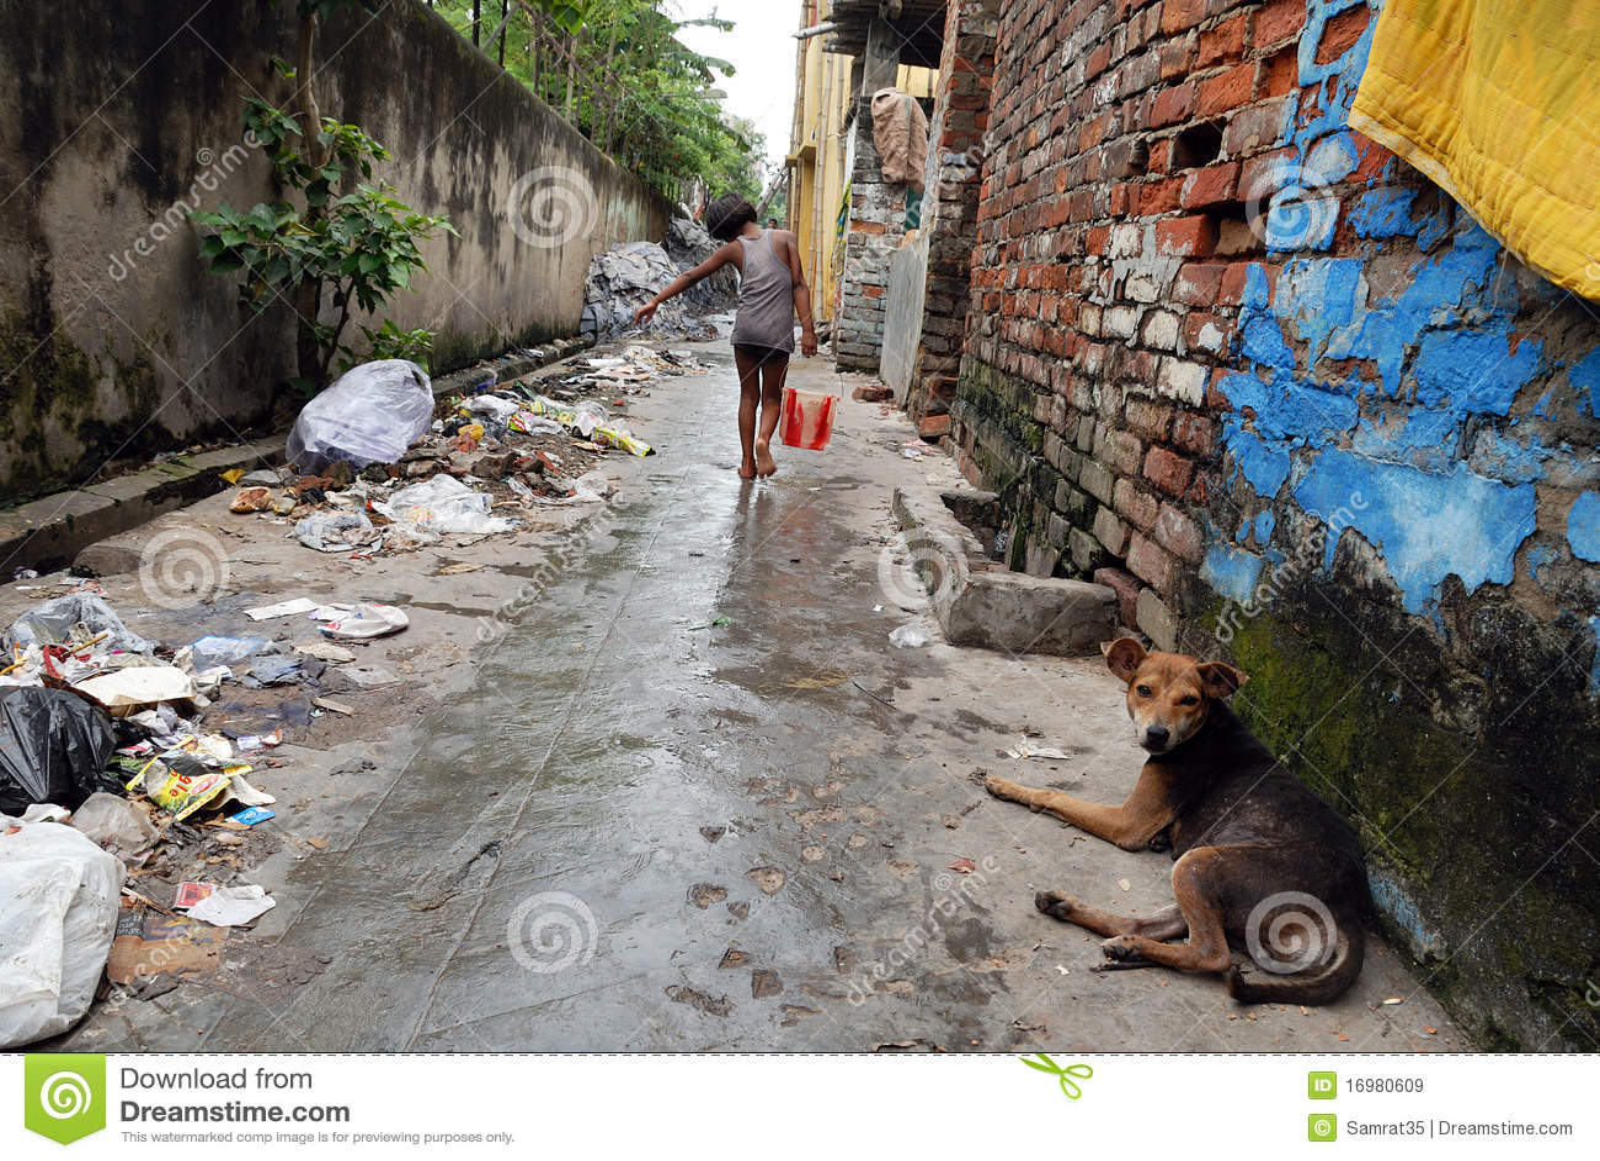 Slum Dwellers Of Kolkata-India Editorial Photo - Image of